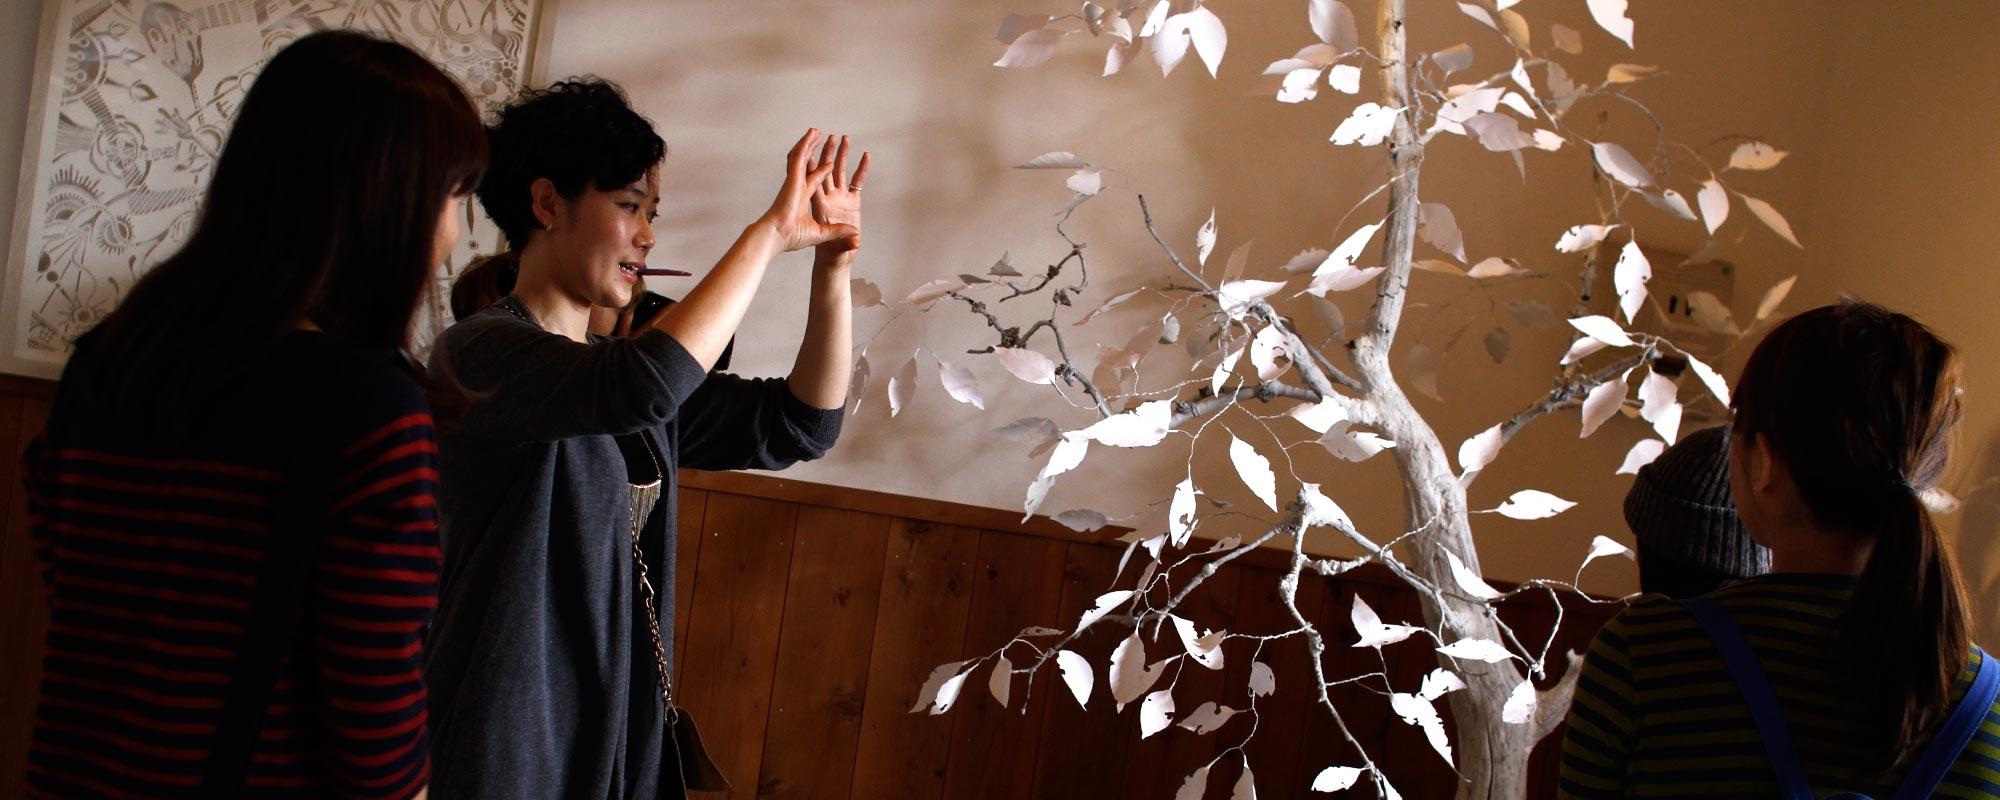 Motoe-Kawashima-Artwork-Japan